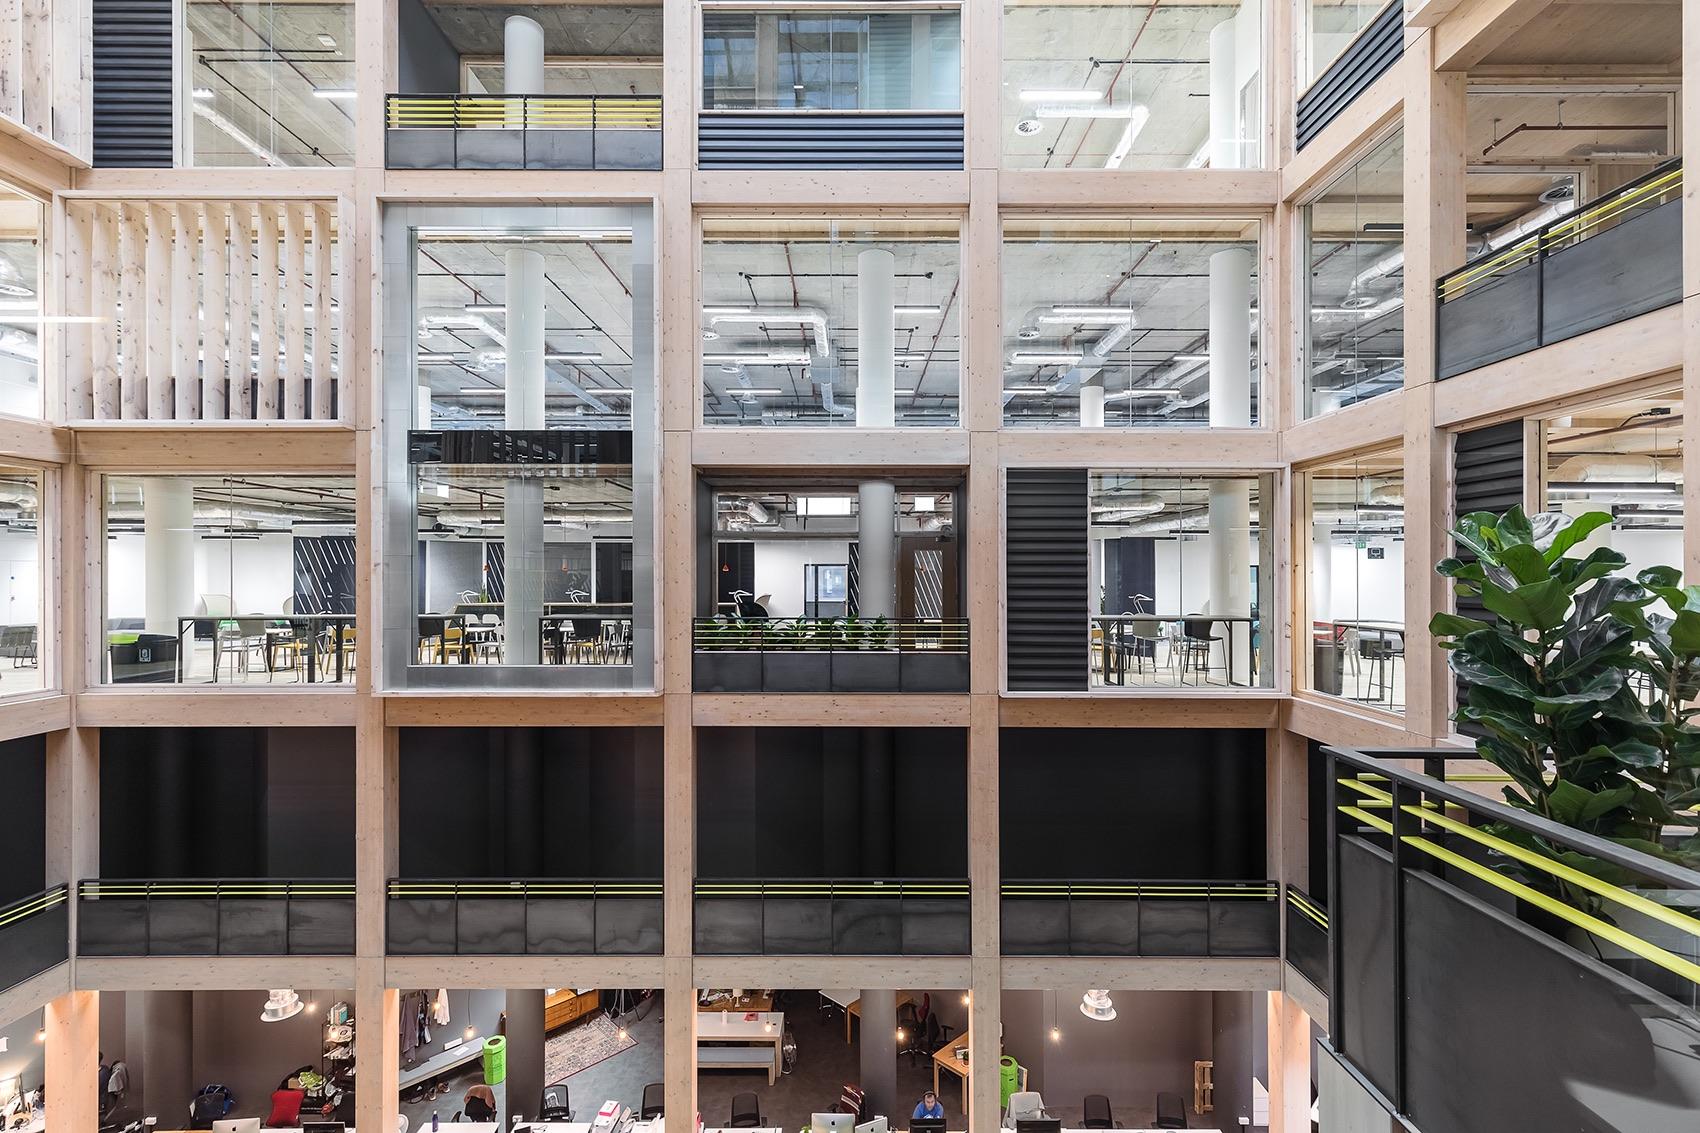 anglia-ruskin-university-office-london-7